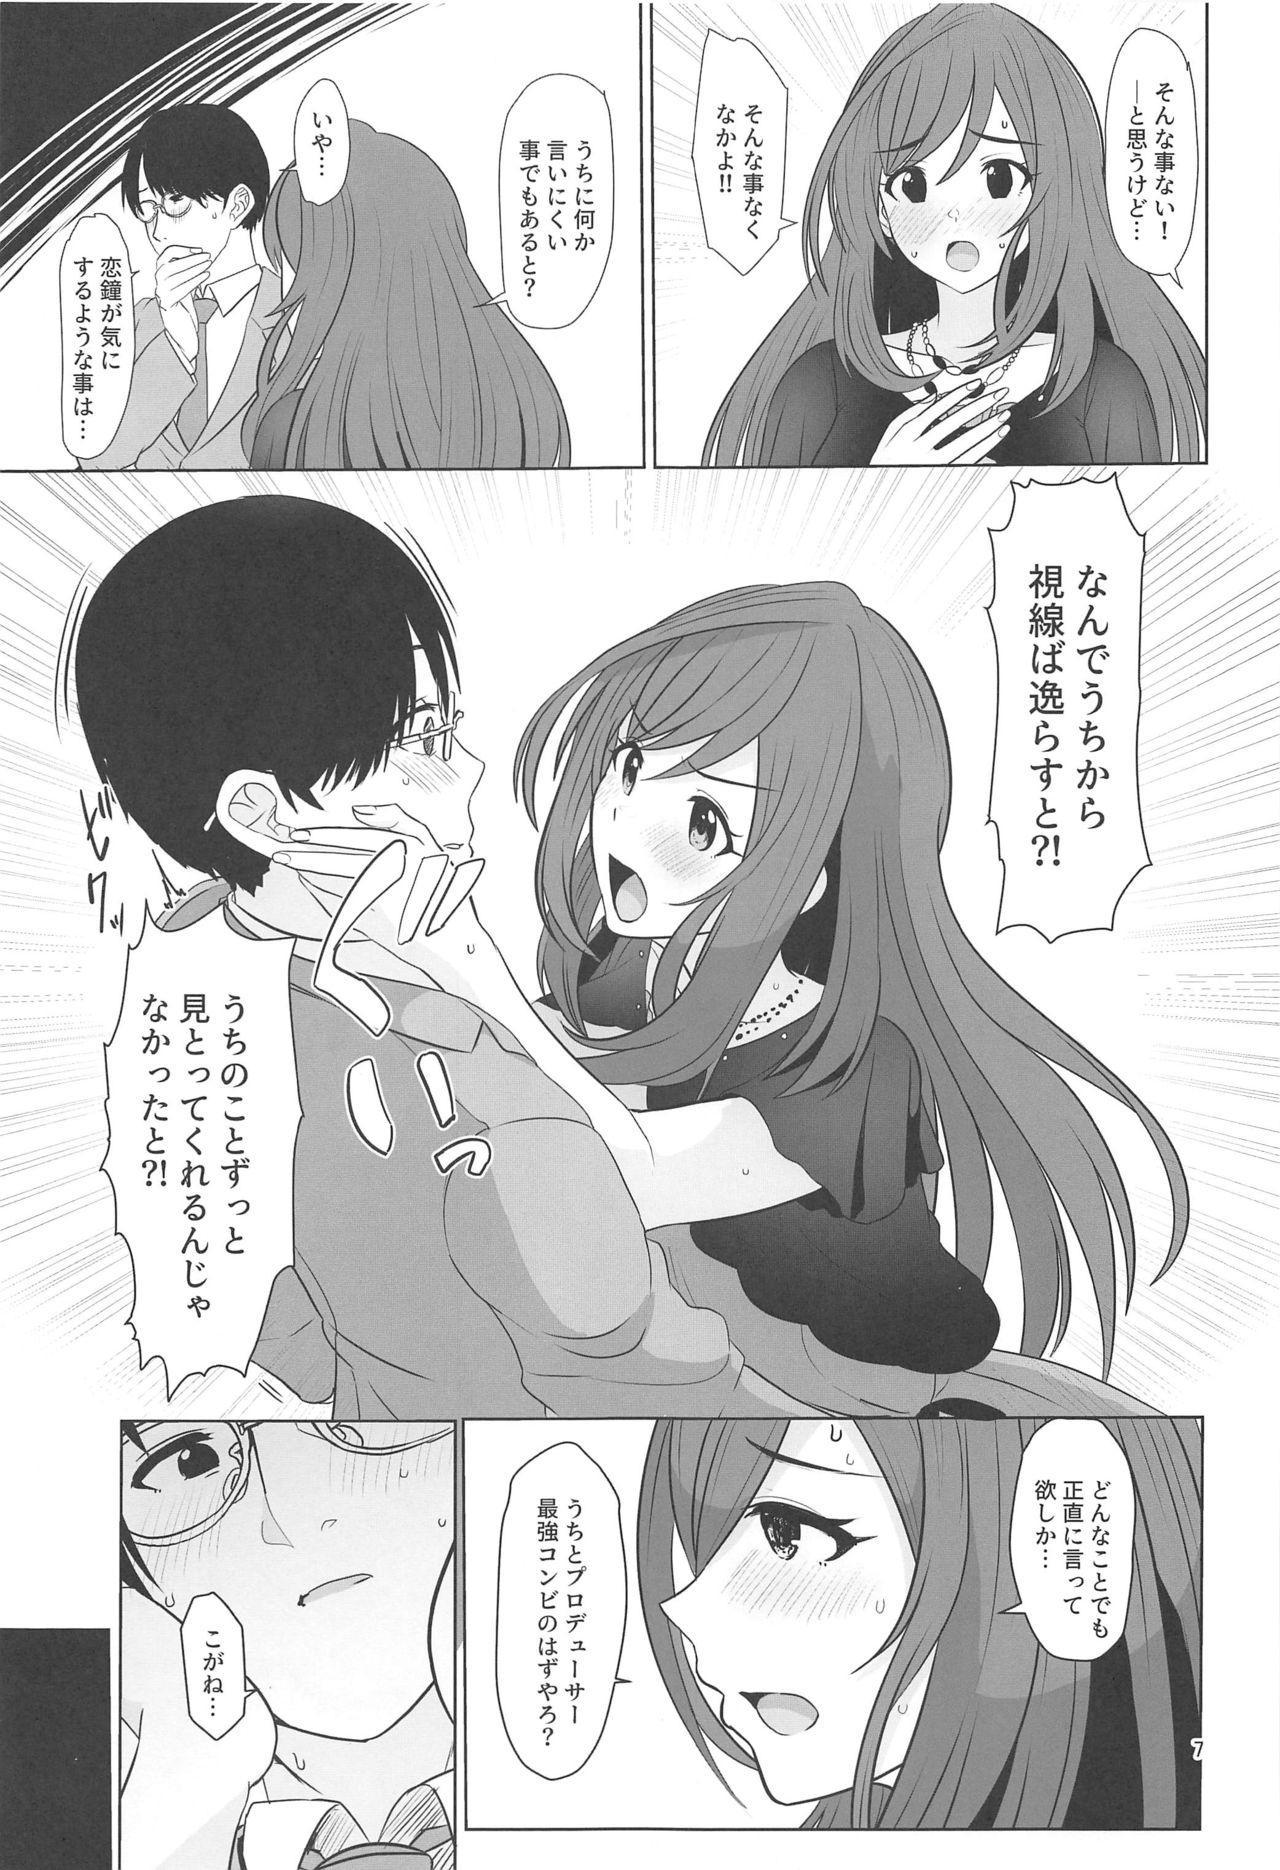 Kokoro Ubaware Koi Kogare 7